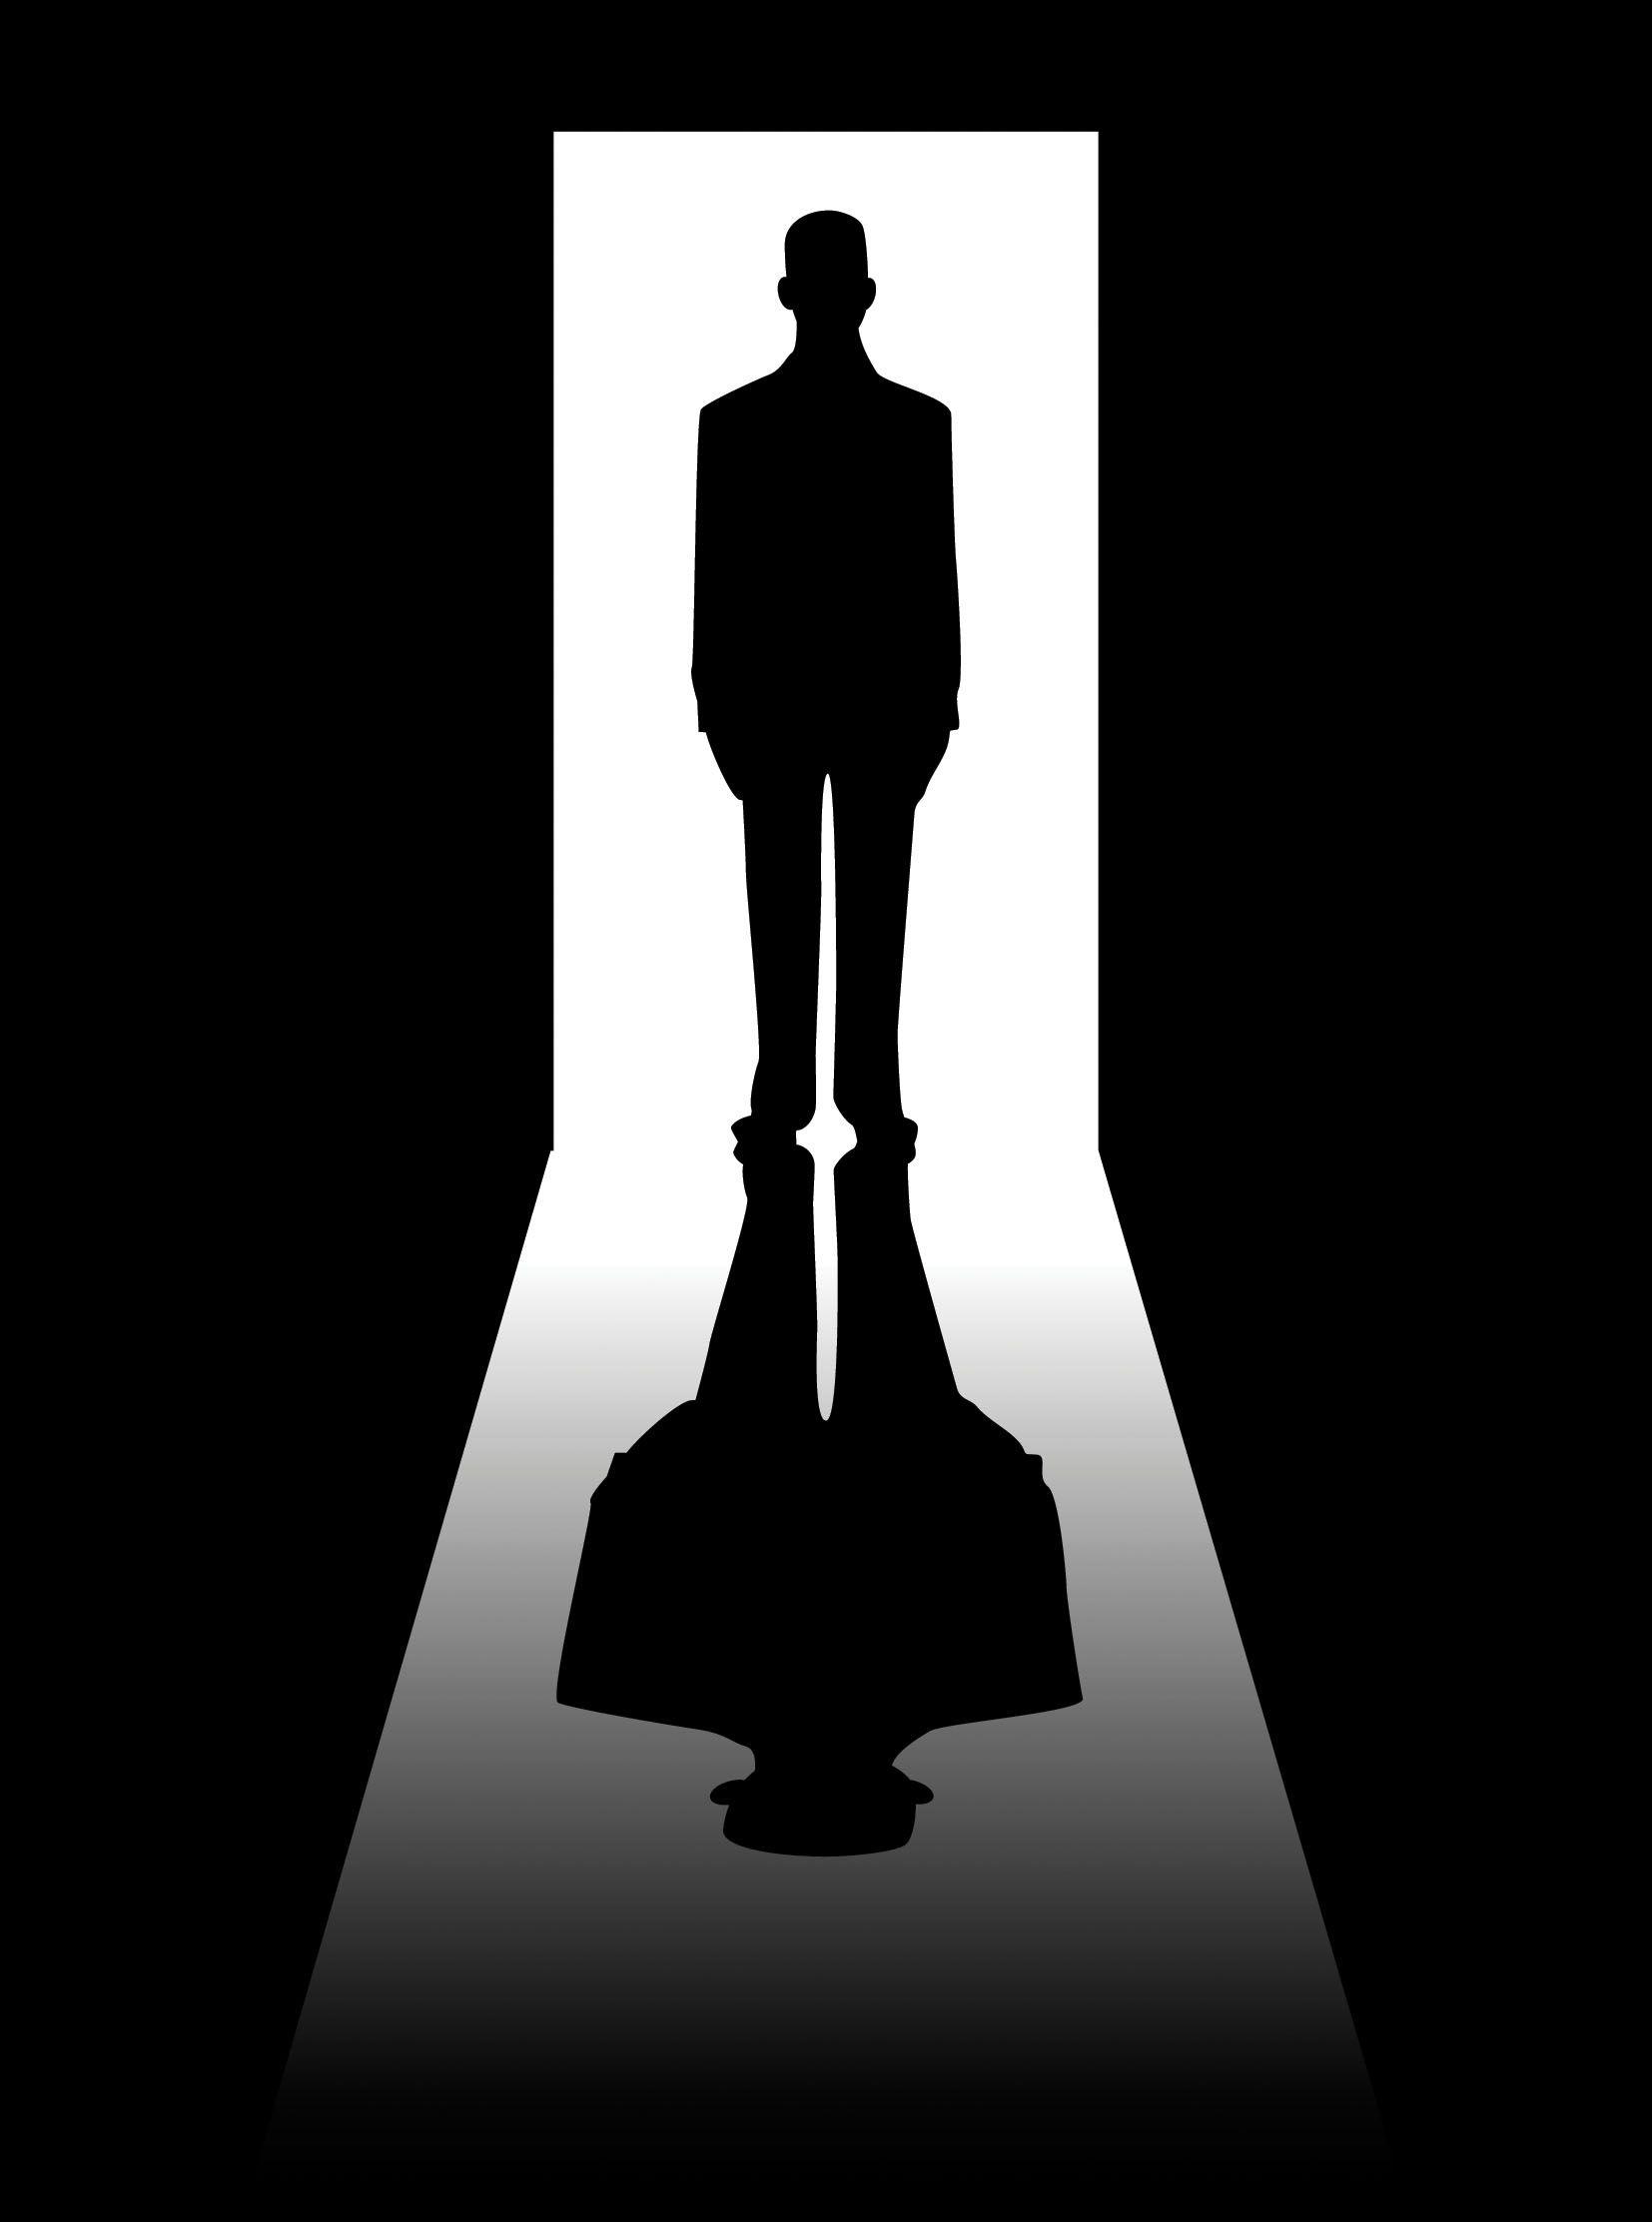 shadow Pesquisa Google Black & Wite Pinterest